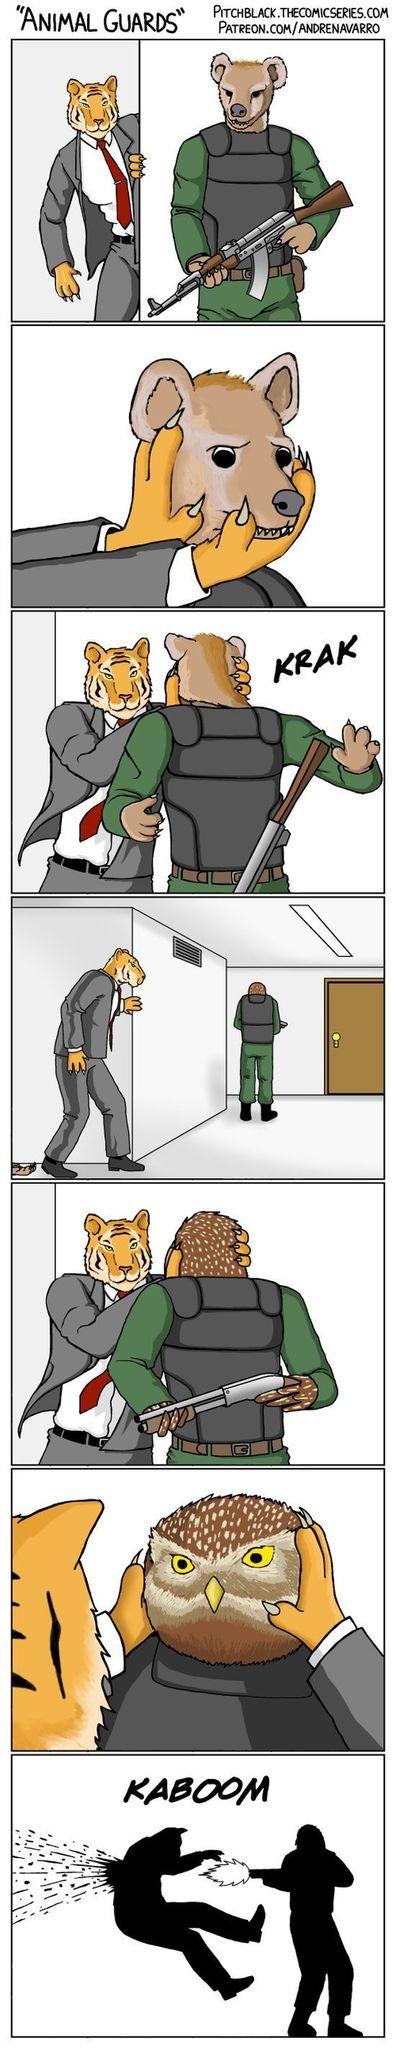 animal guards - meme